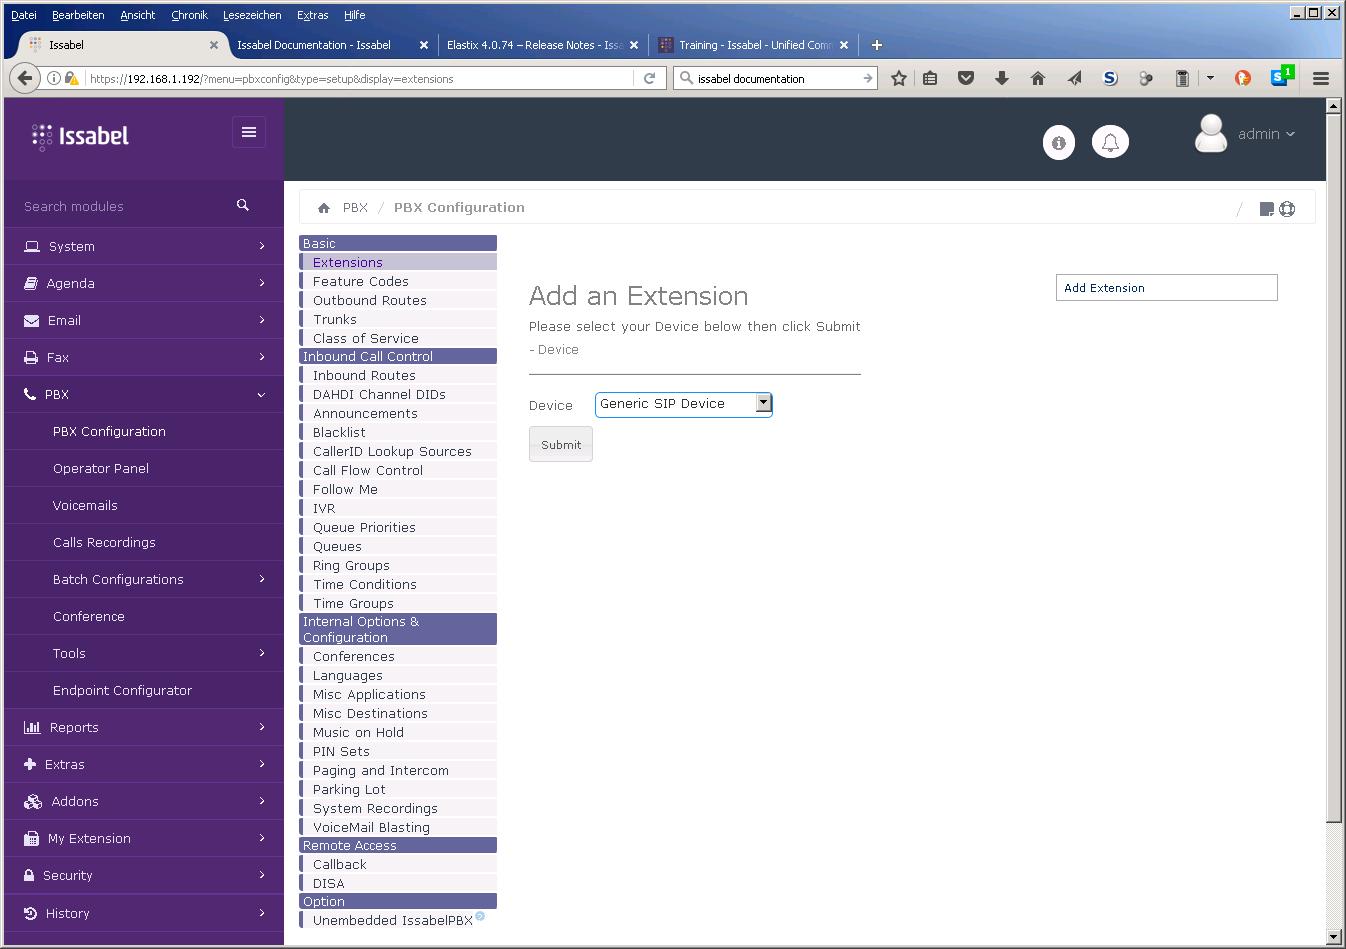 Elastix moved on 3CX - Chat - NethServer Community